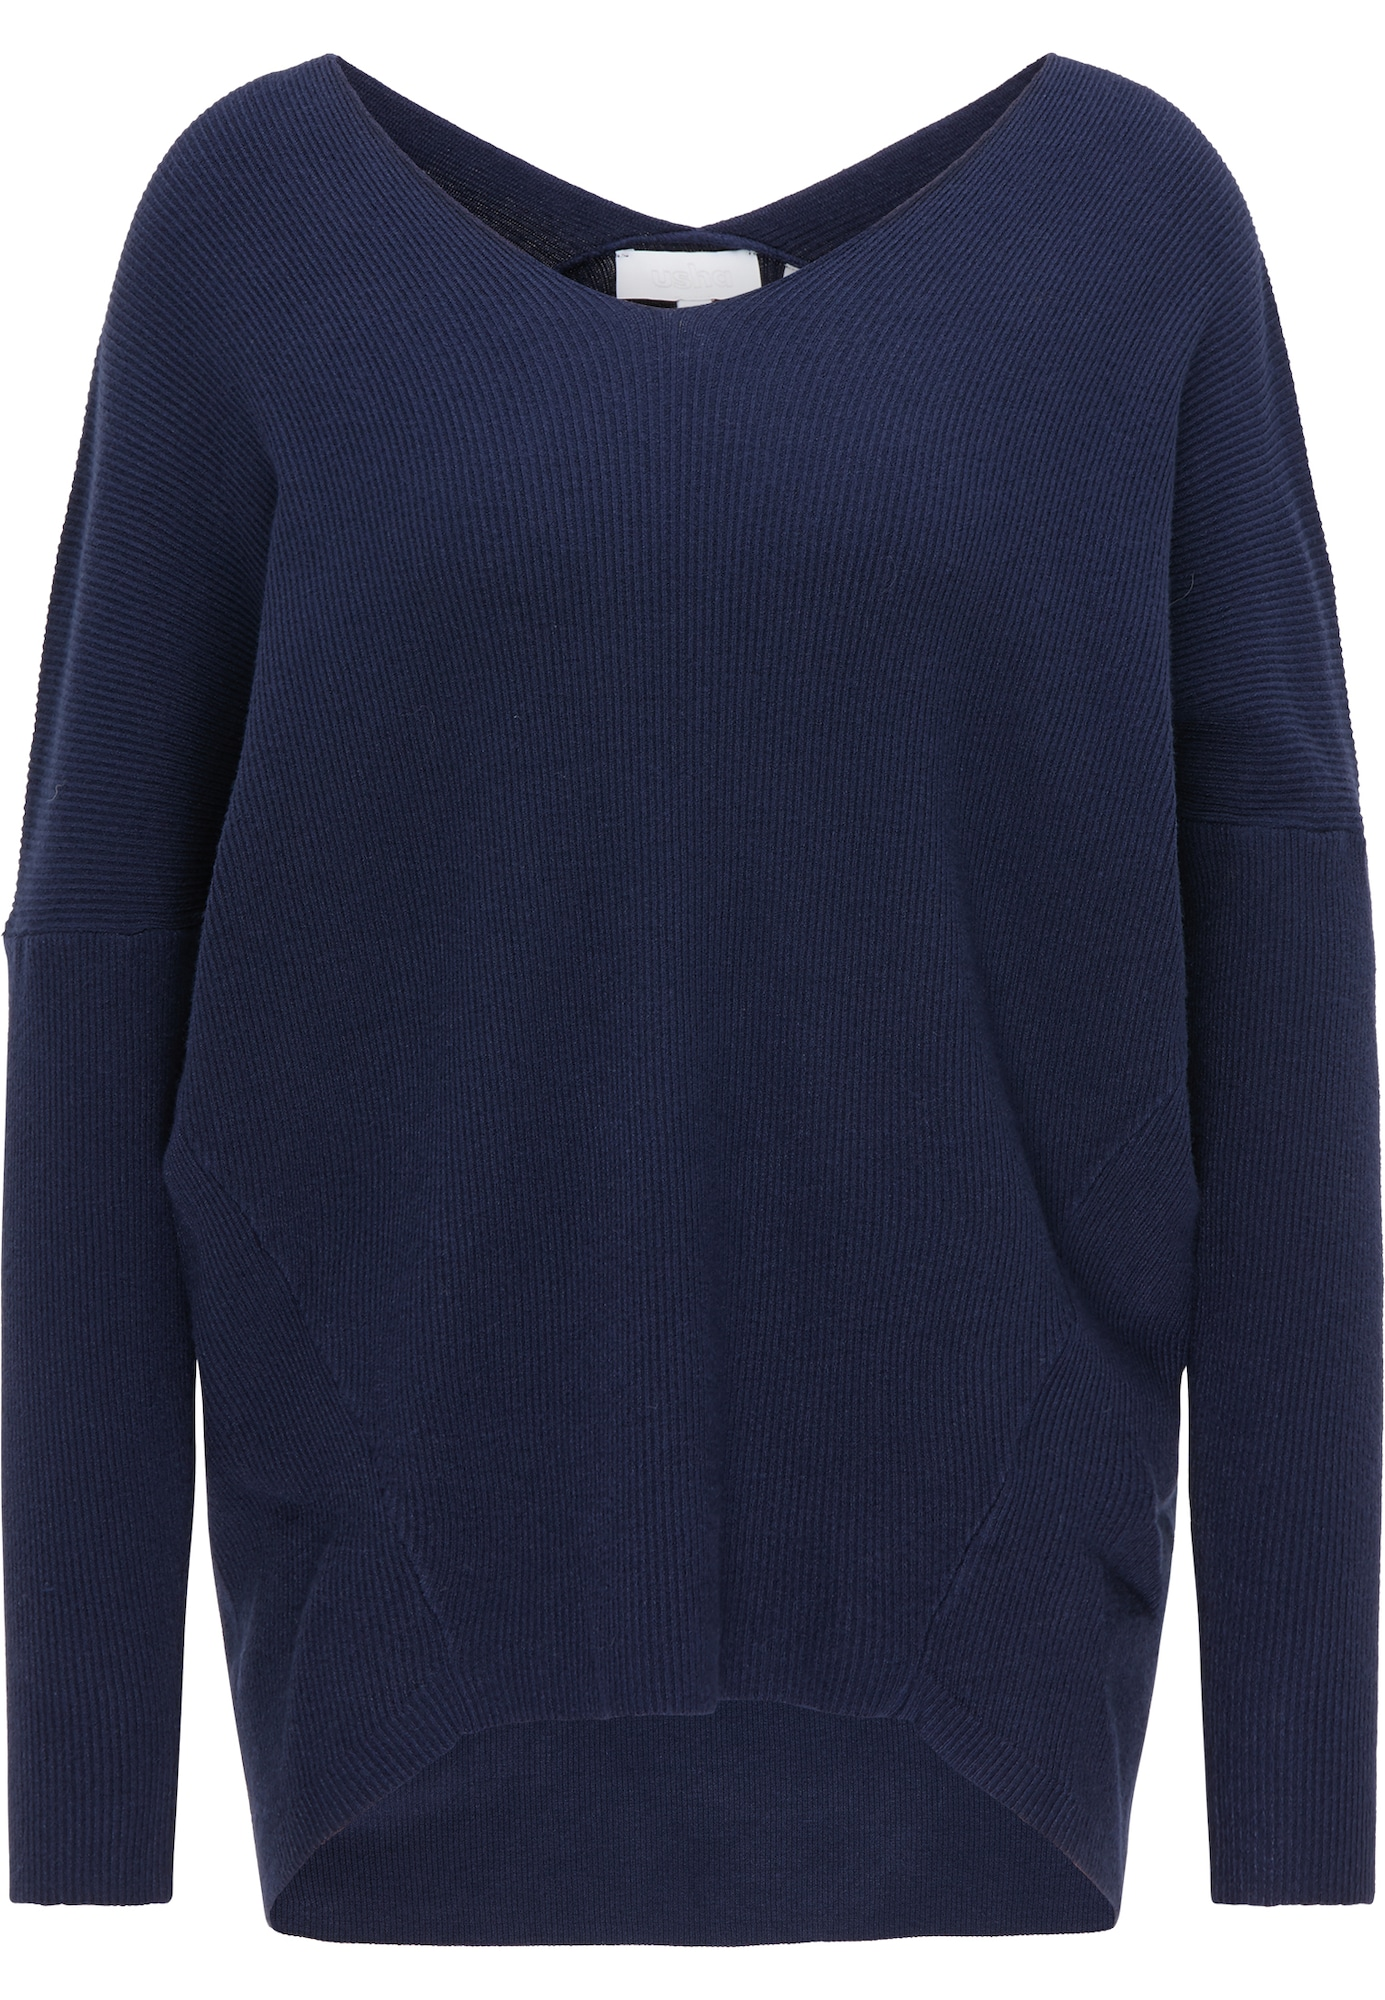 usha WHITE LABEL Megztinis tamsiai mėlyna